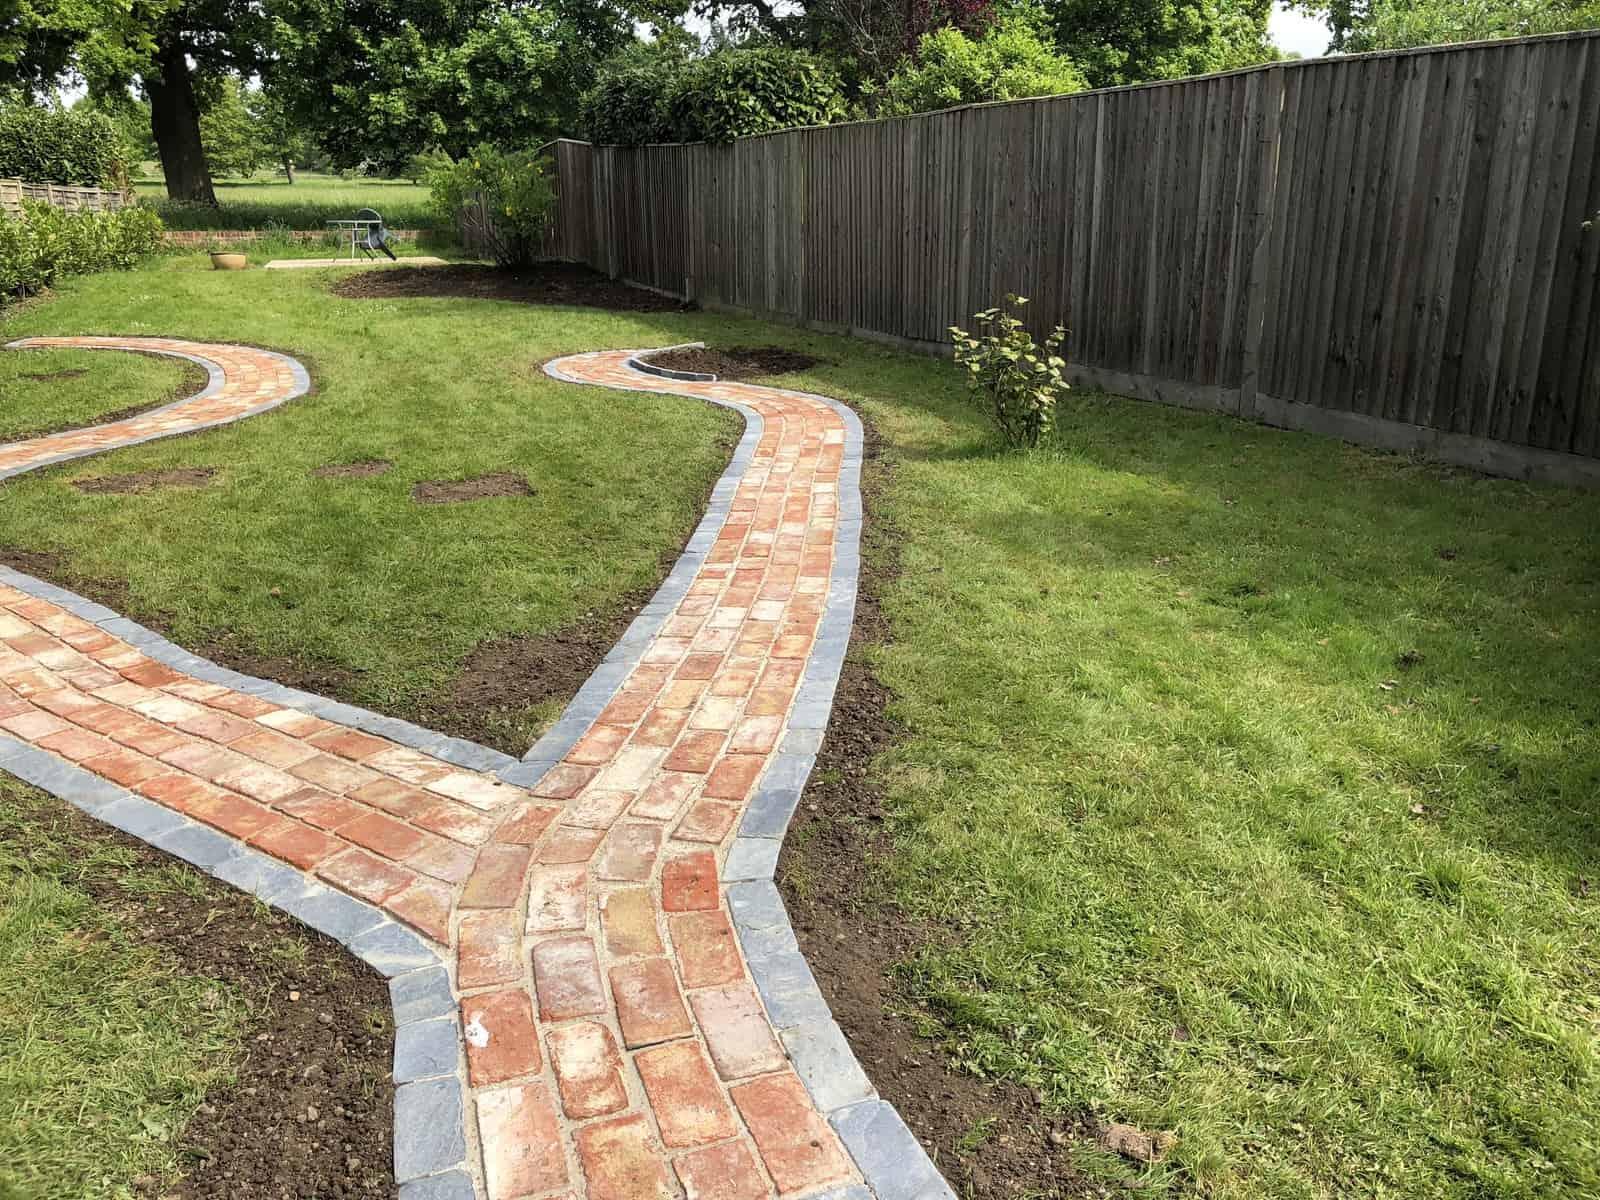 garden pathway made of slate edging stones and reclaimed bricks